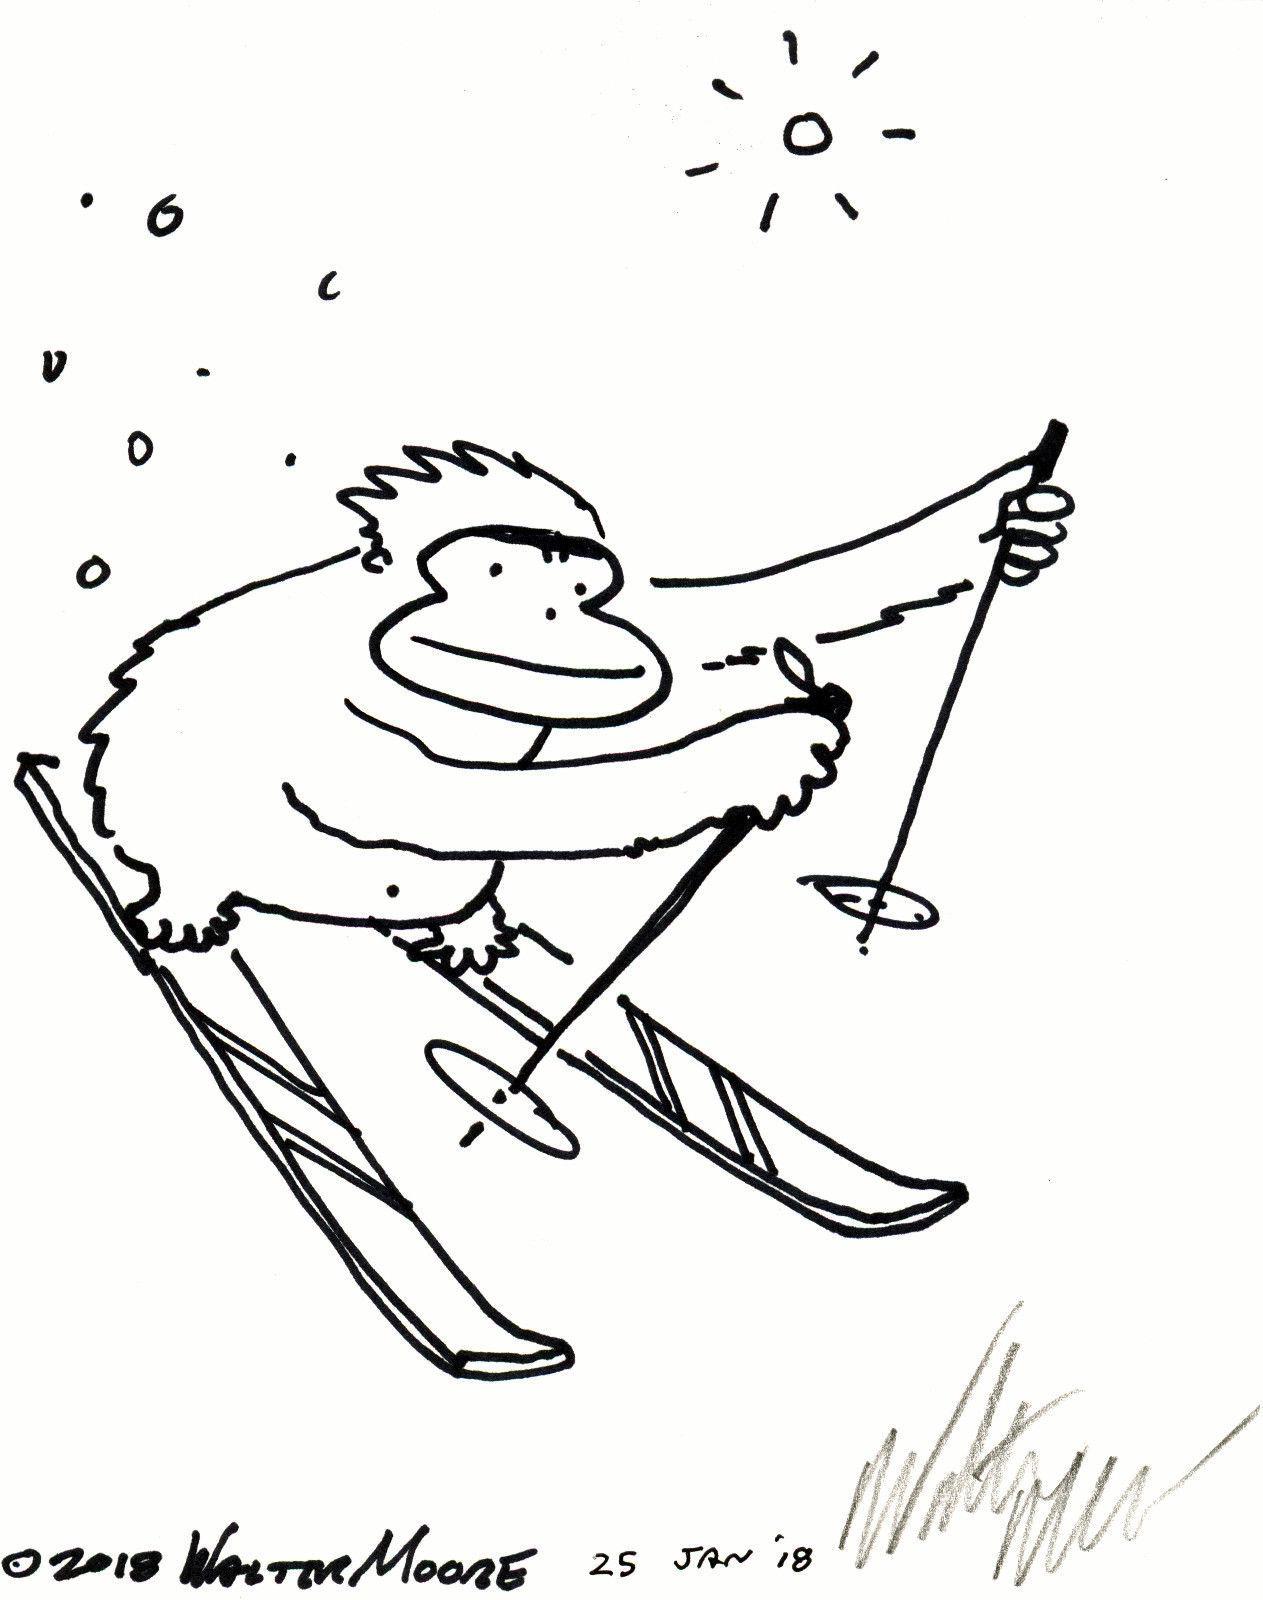 Ski, Ape, Ski!, Original Signed Cartoon by Walter Moore